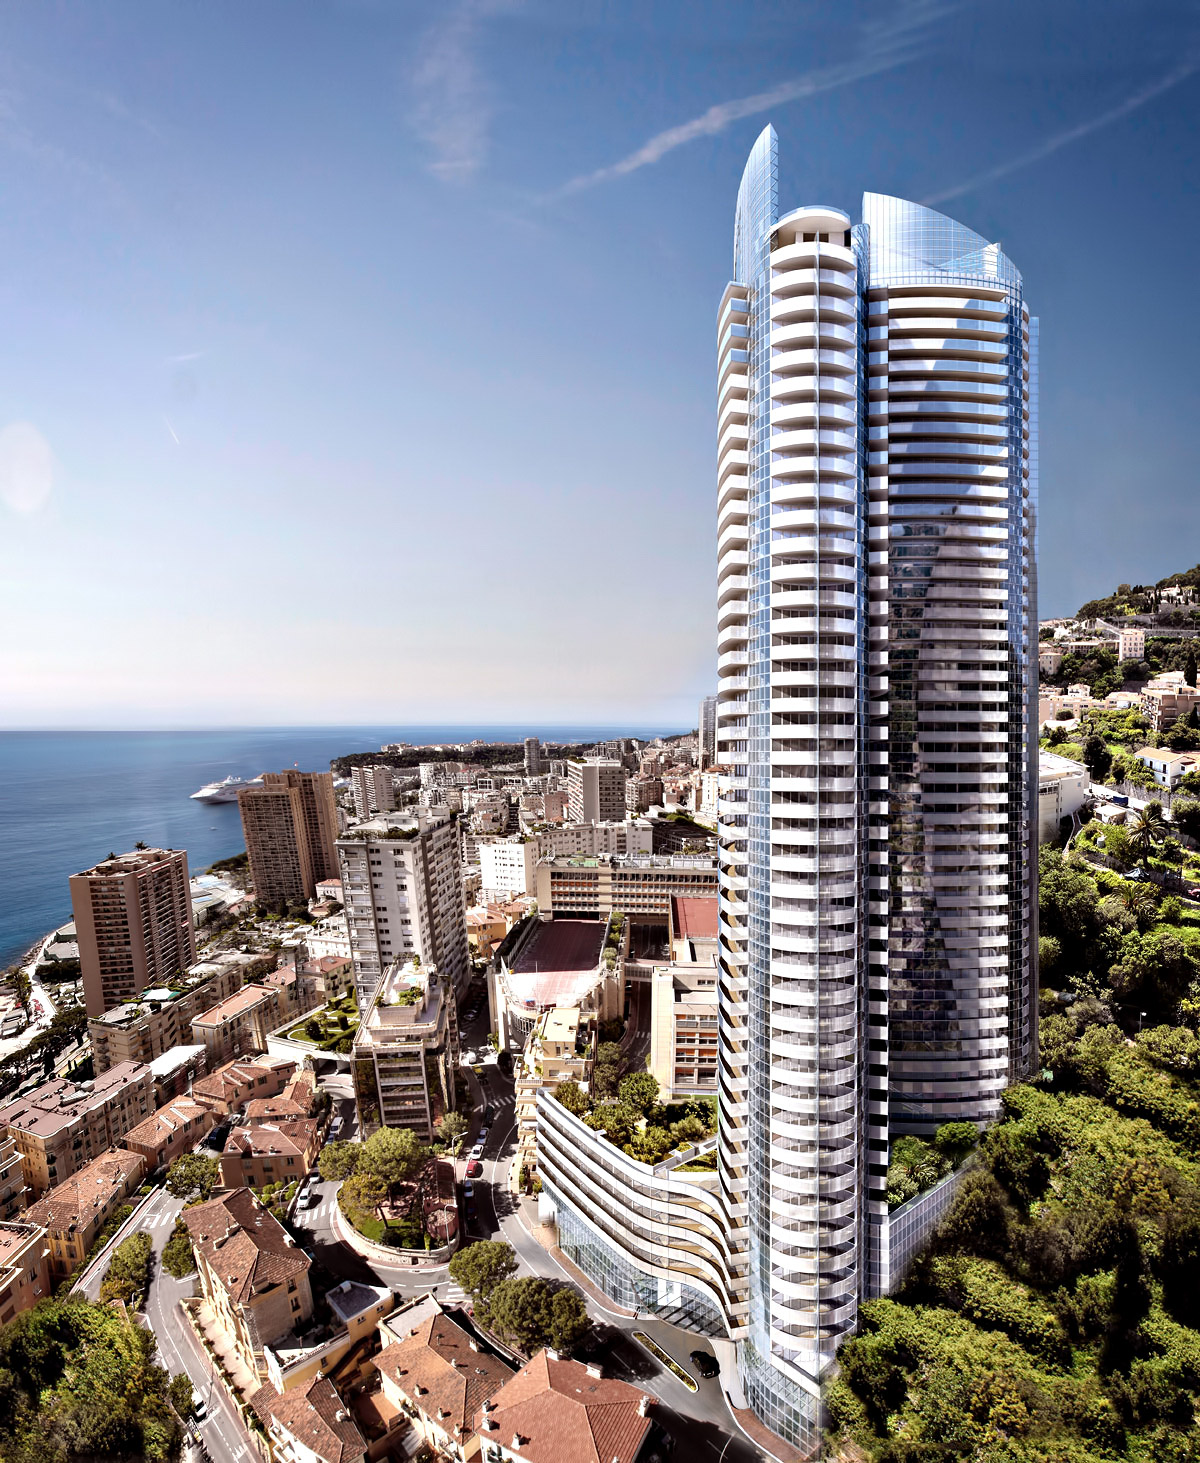 05 Tour Odeon Tower Penthouse 36 Avenue de lAnnonciade Monaco